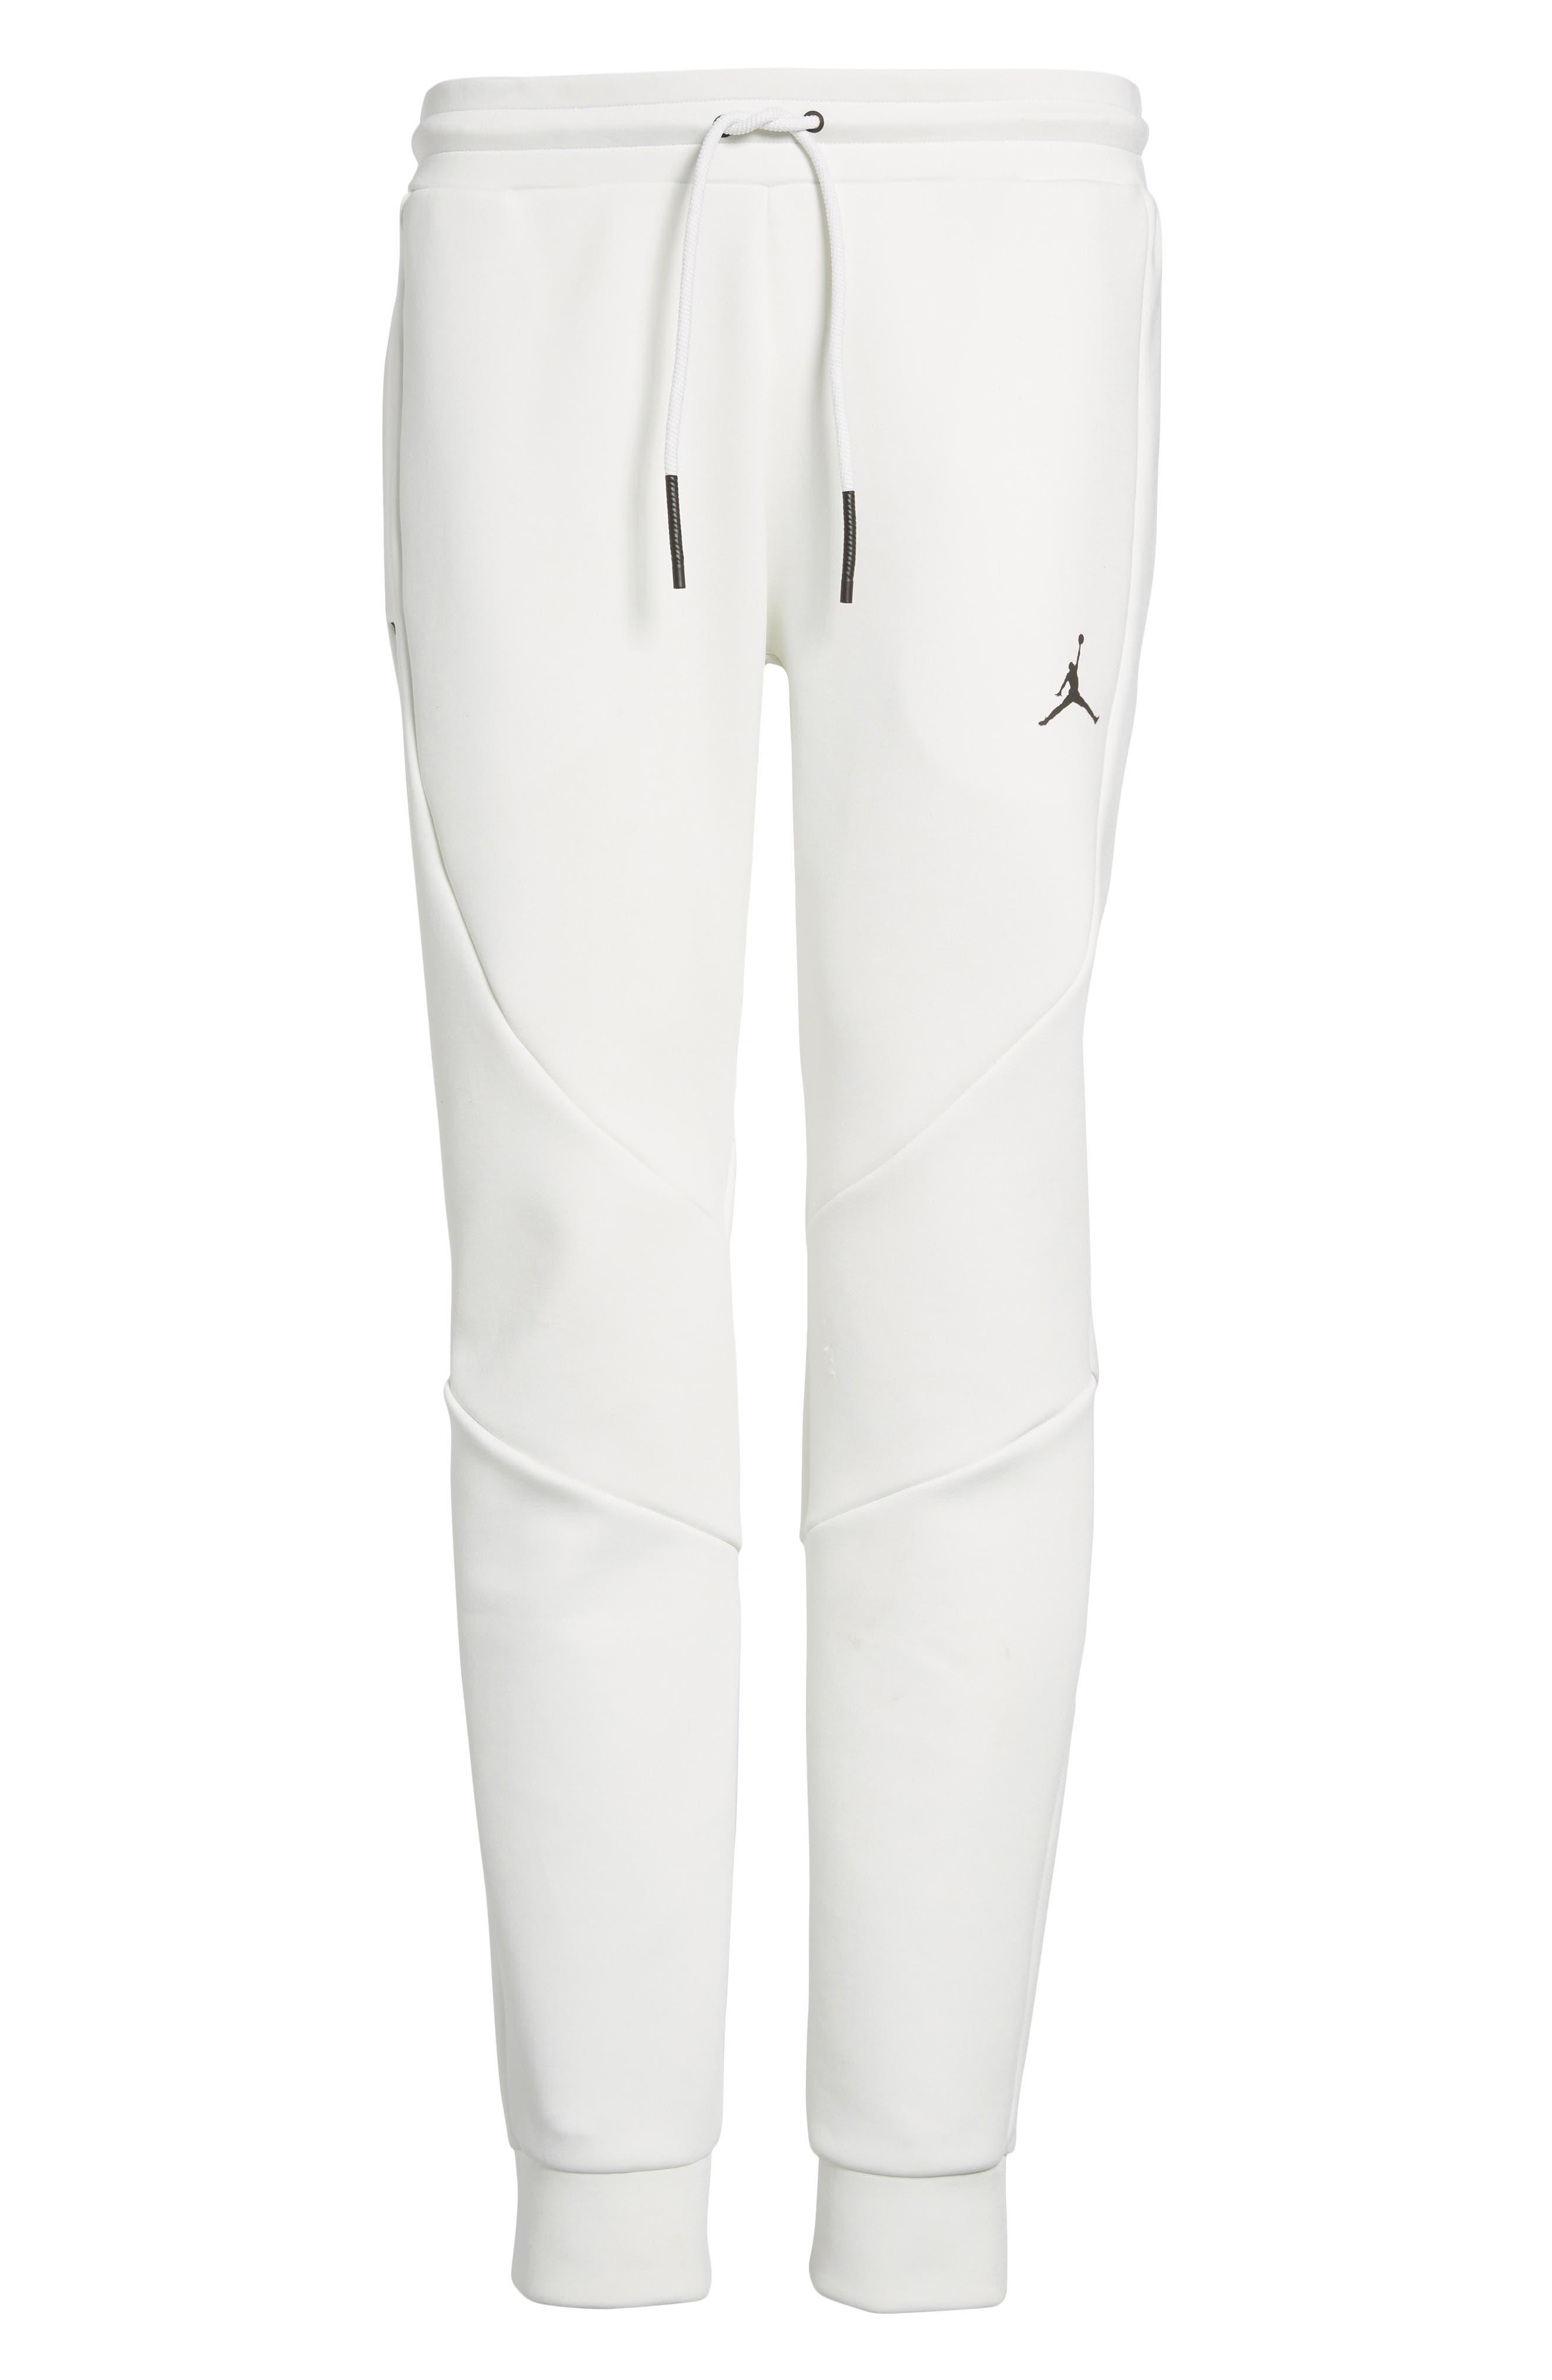 Sportswear Flight Tech Pants,                             Alternate thumbnail 6, color,                             Summit White/ Black